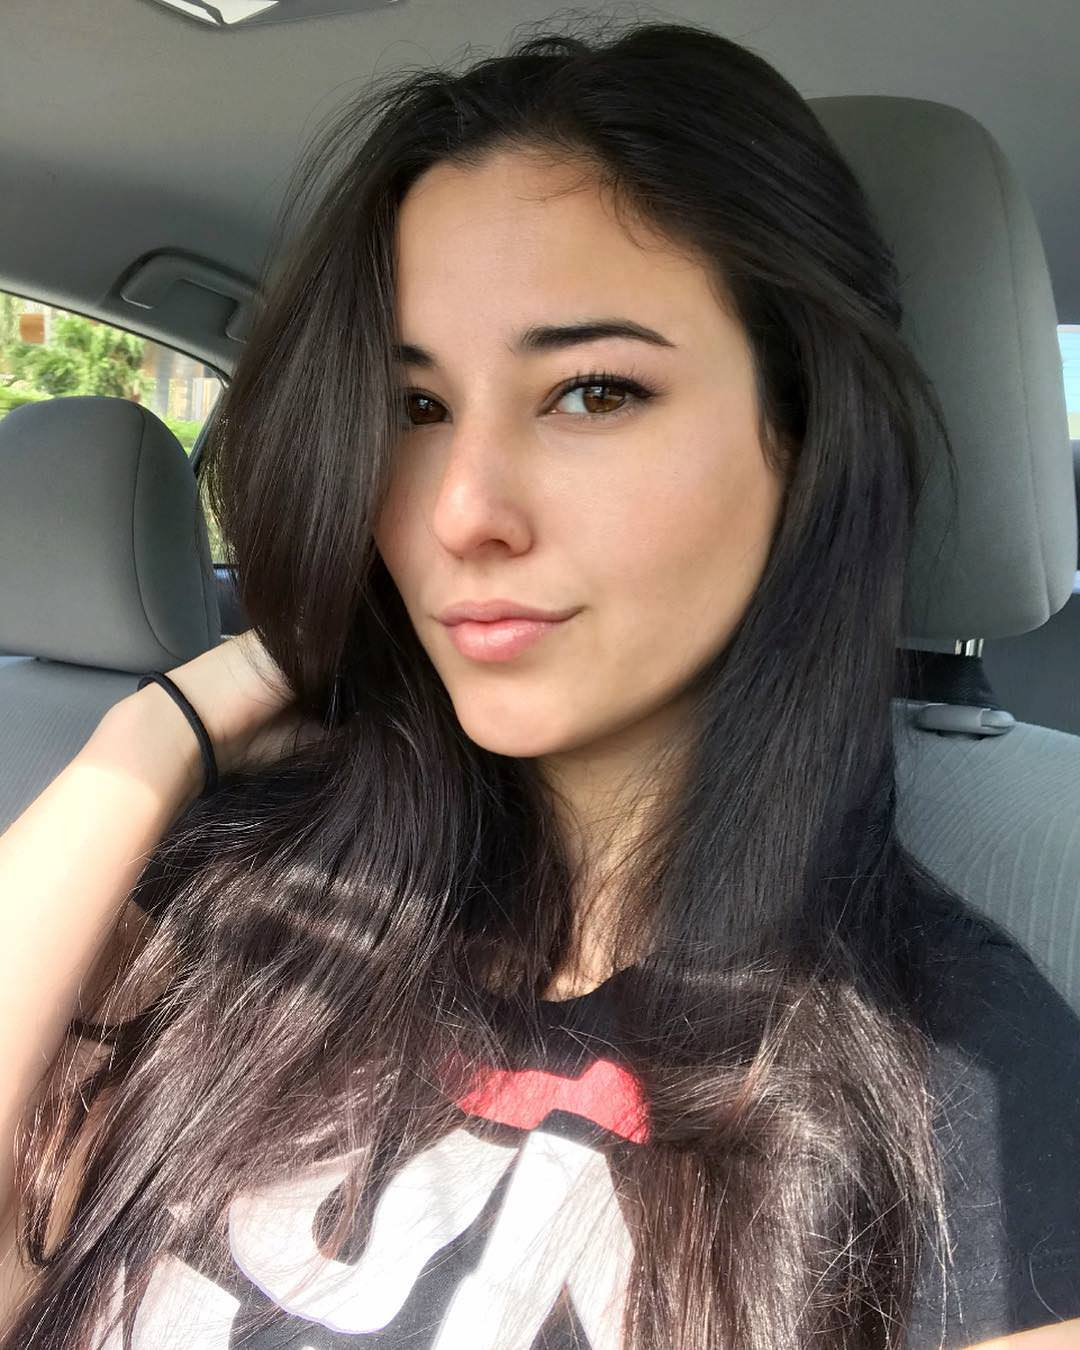 Angie Varona_scammerinfo_32